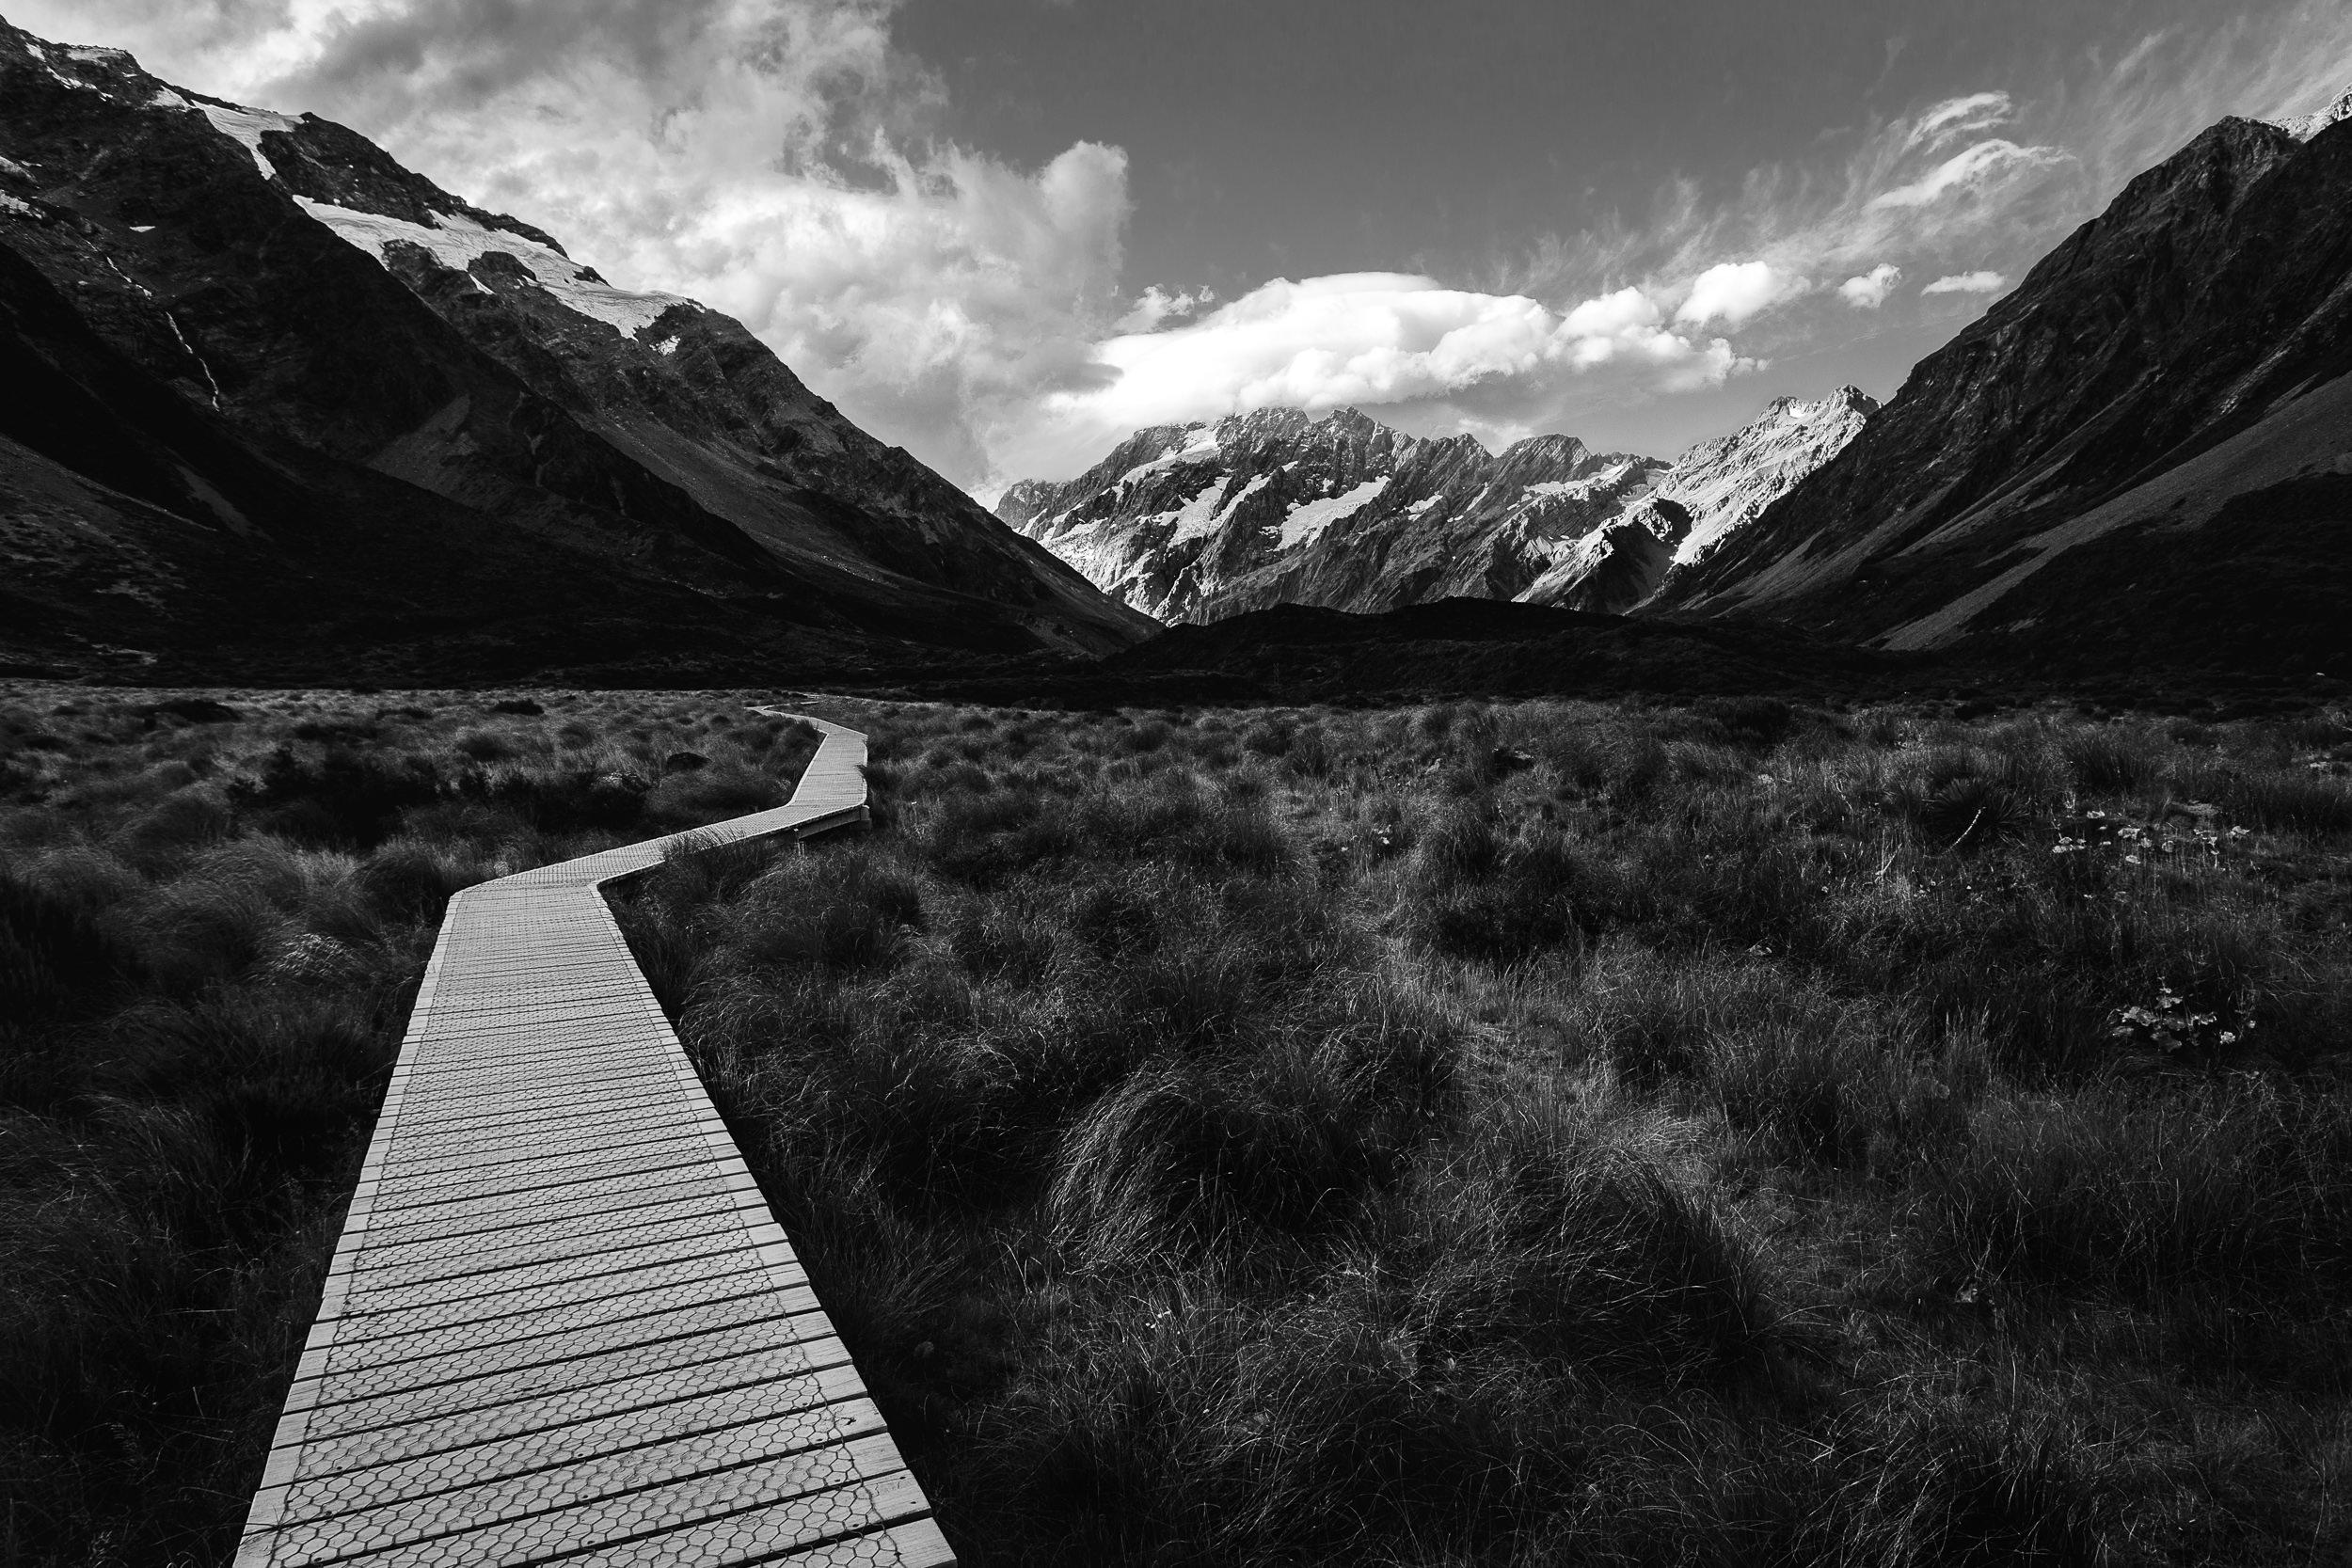 2018.03.12_NZ_Hooker_Lake-9939-Edit.jpg